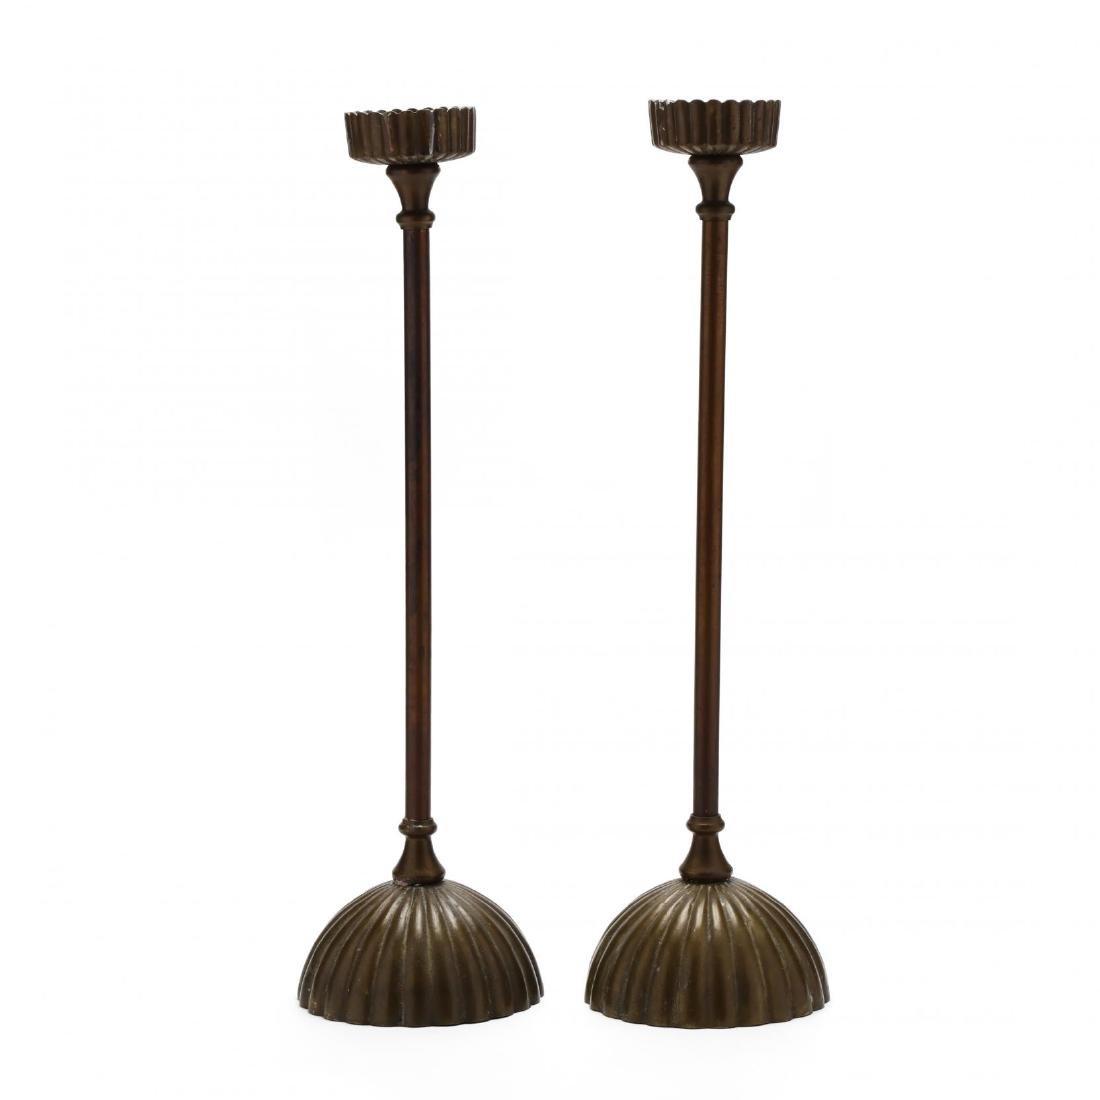 Silvestri, Pair of Modernist Brass Pricket Sticks - 4